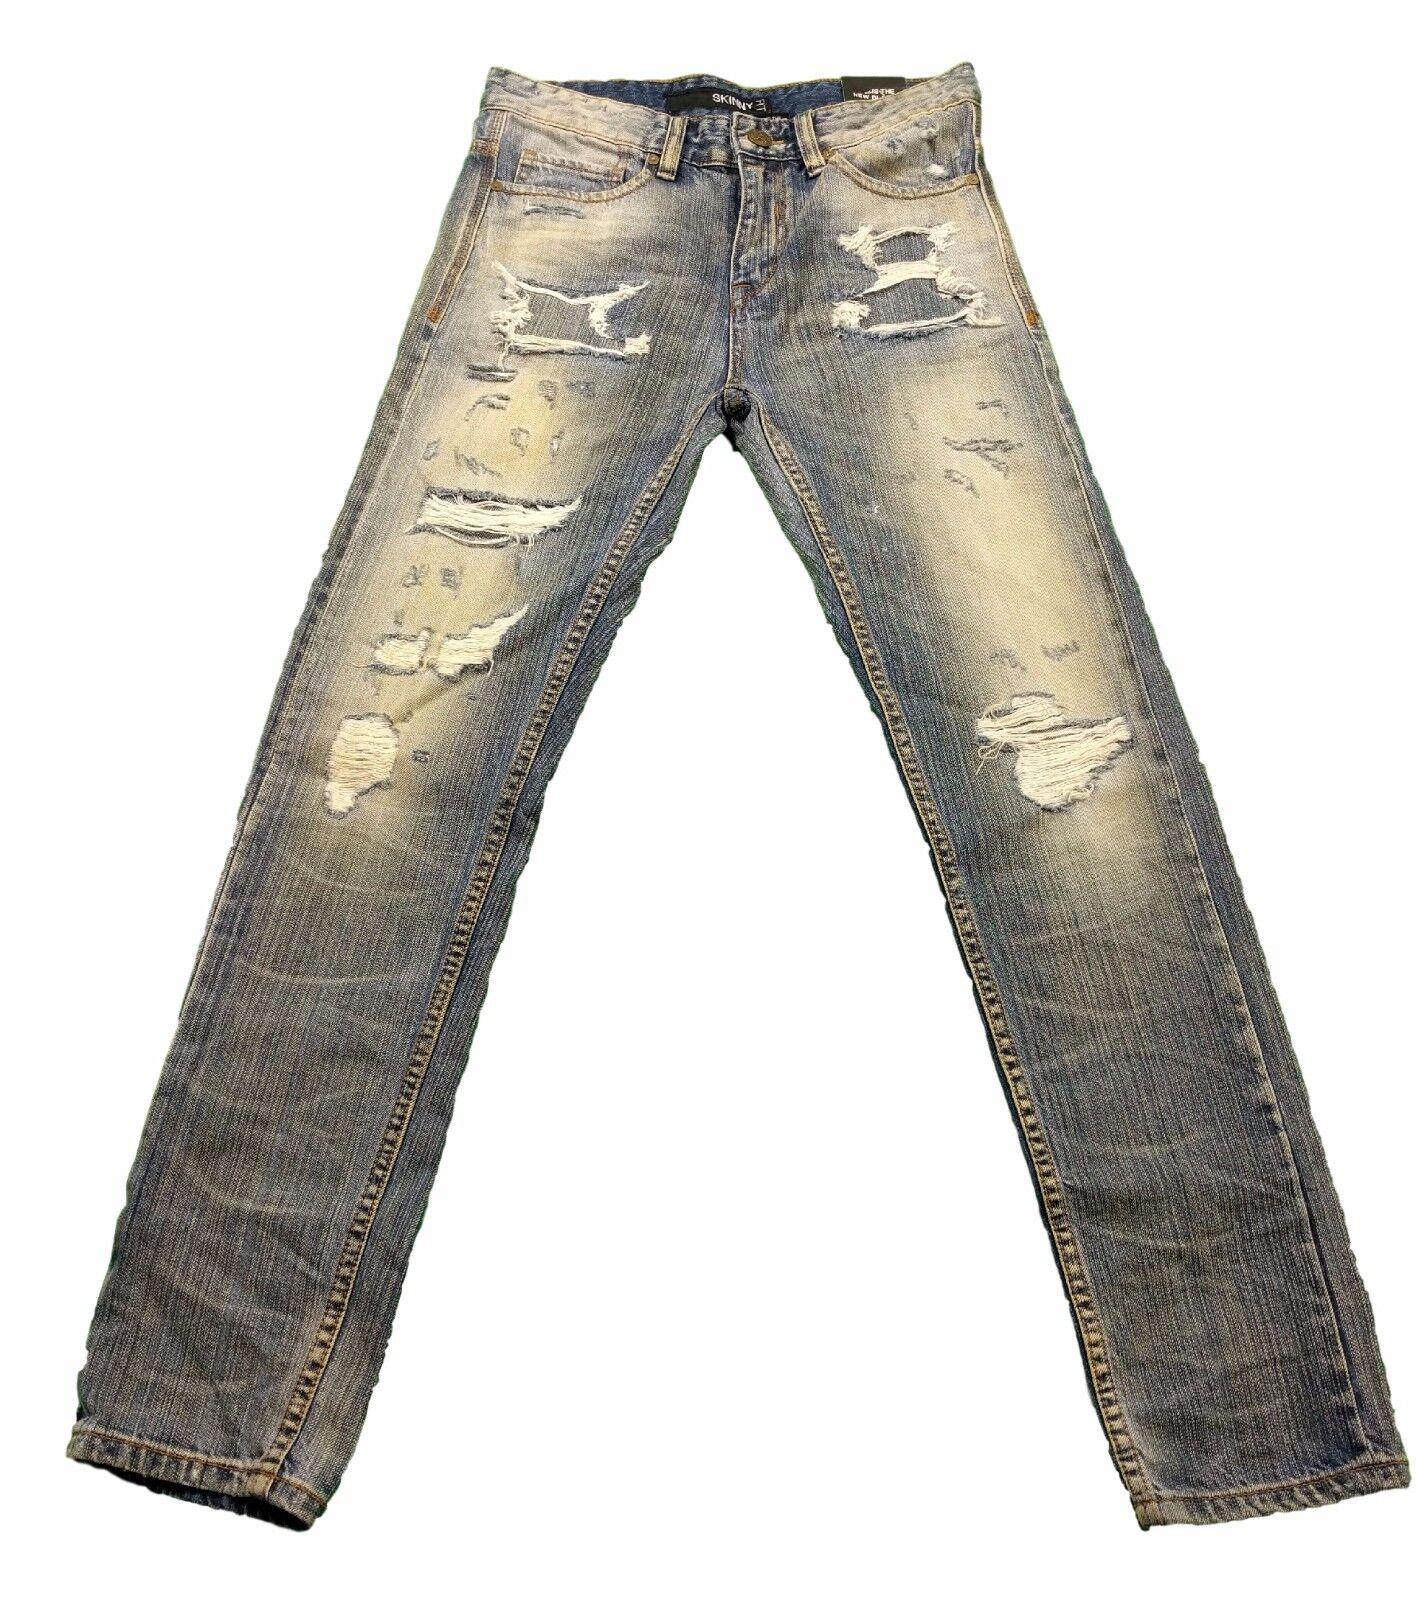 Rocawear Blak Skinny Fit Distressed Jeans in 30x30 MSRP